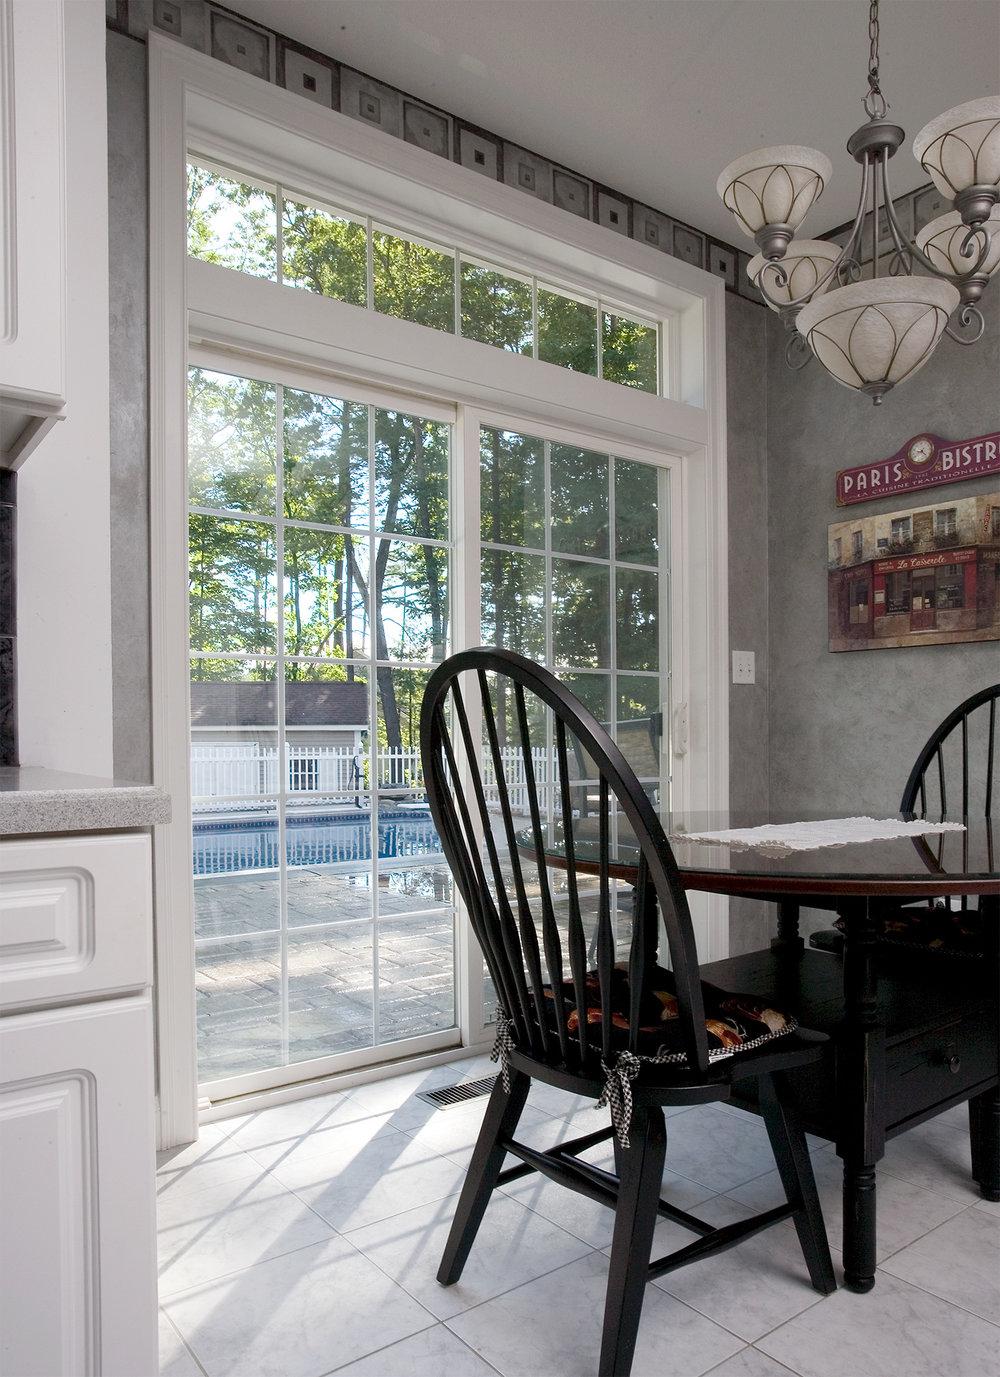 weatherbarr-Pinnacle-patio-door-transom-interior-1.jpg